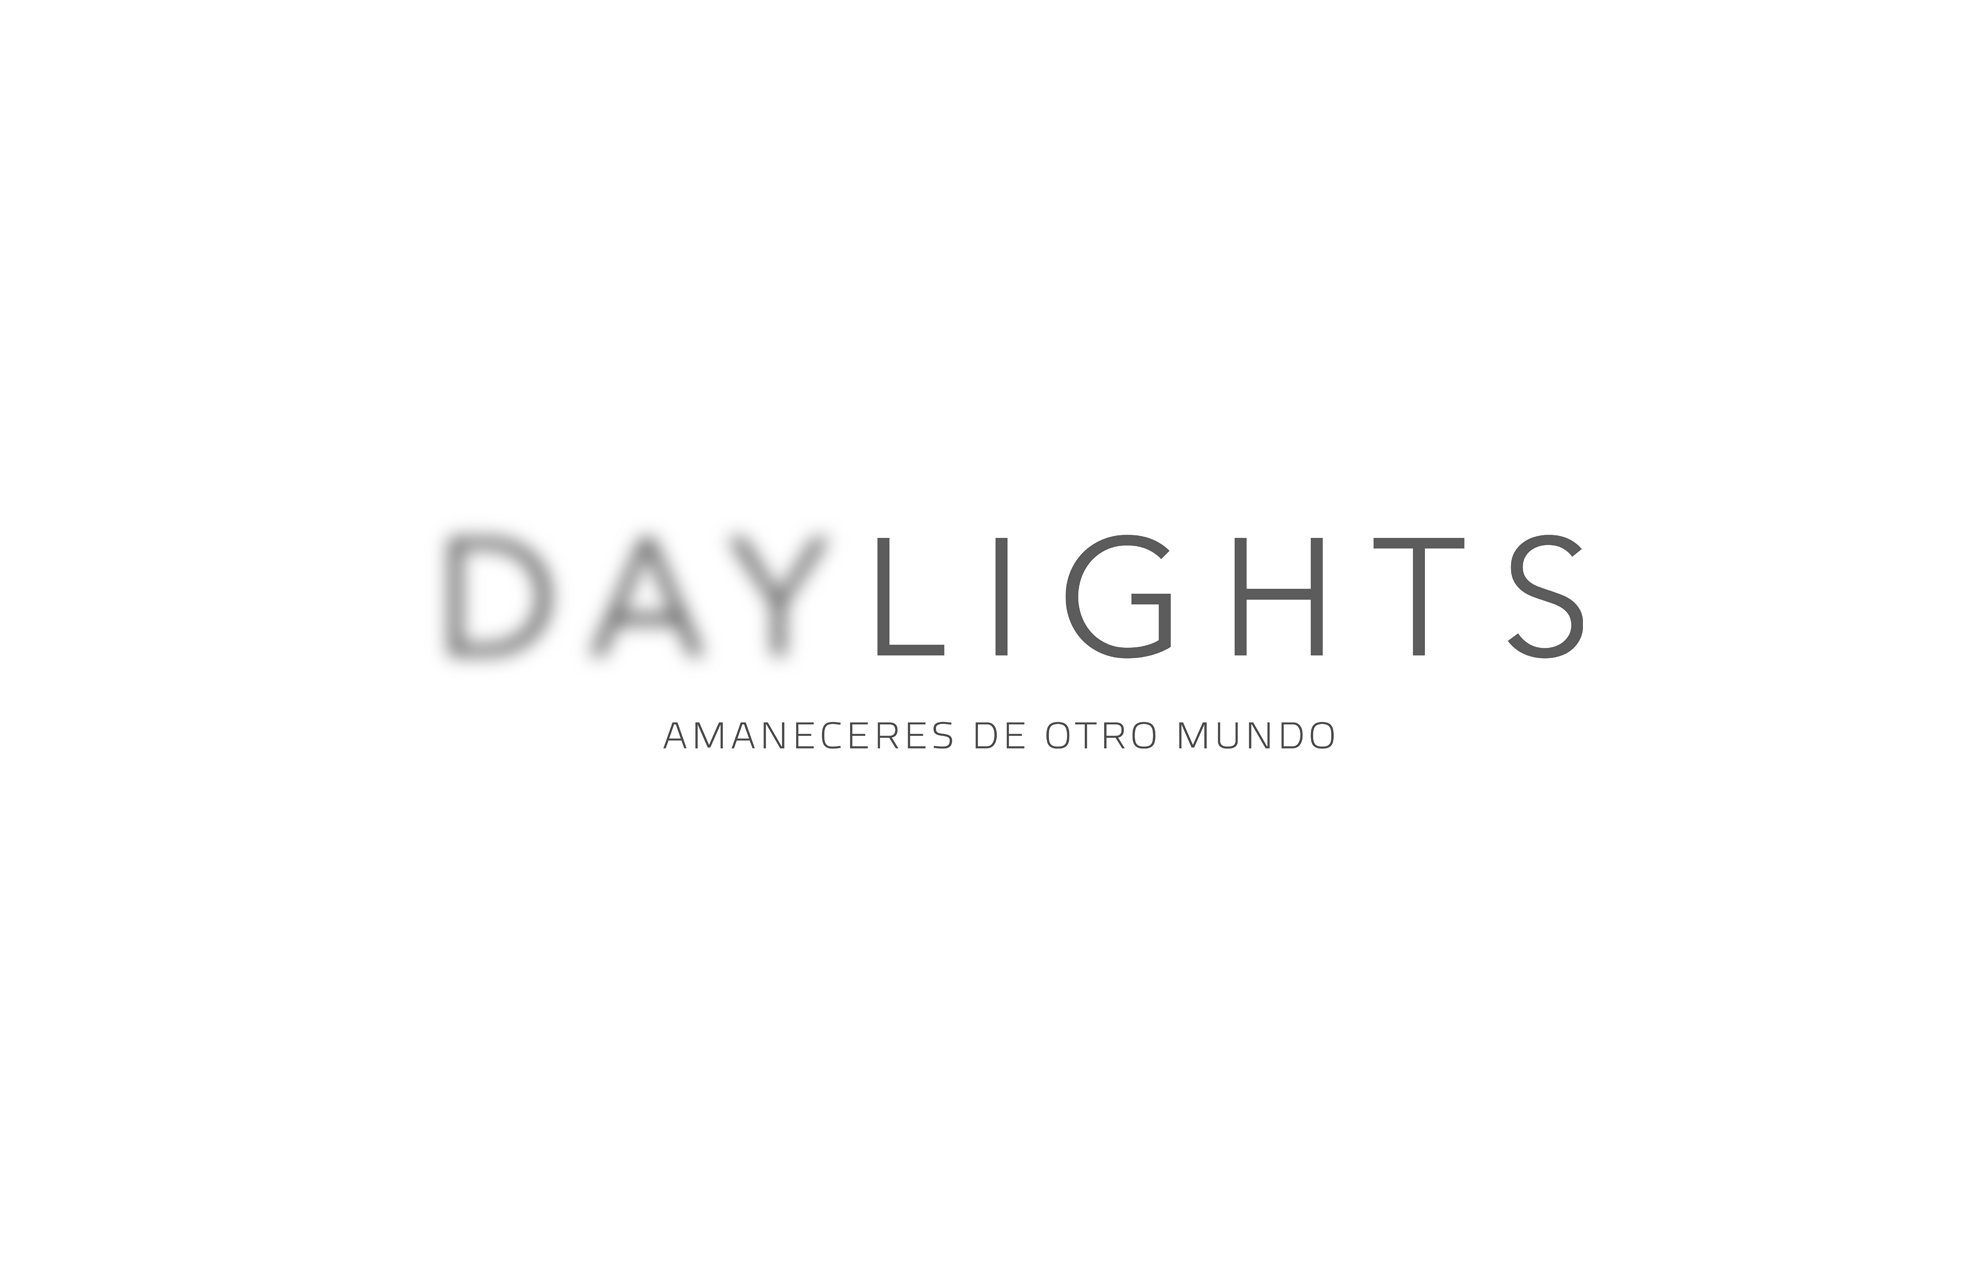 daylights_2